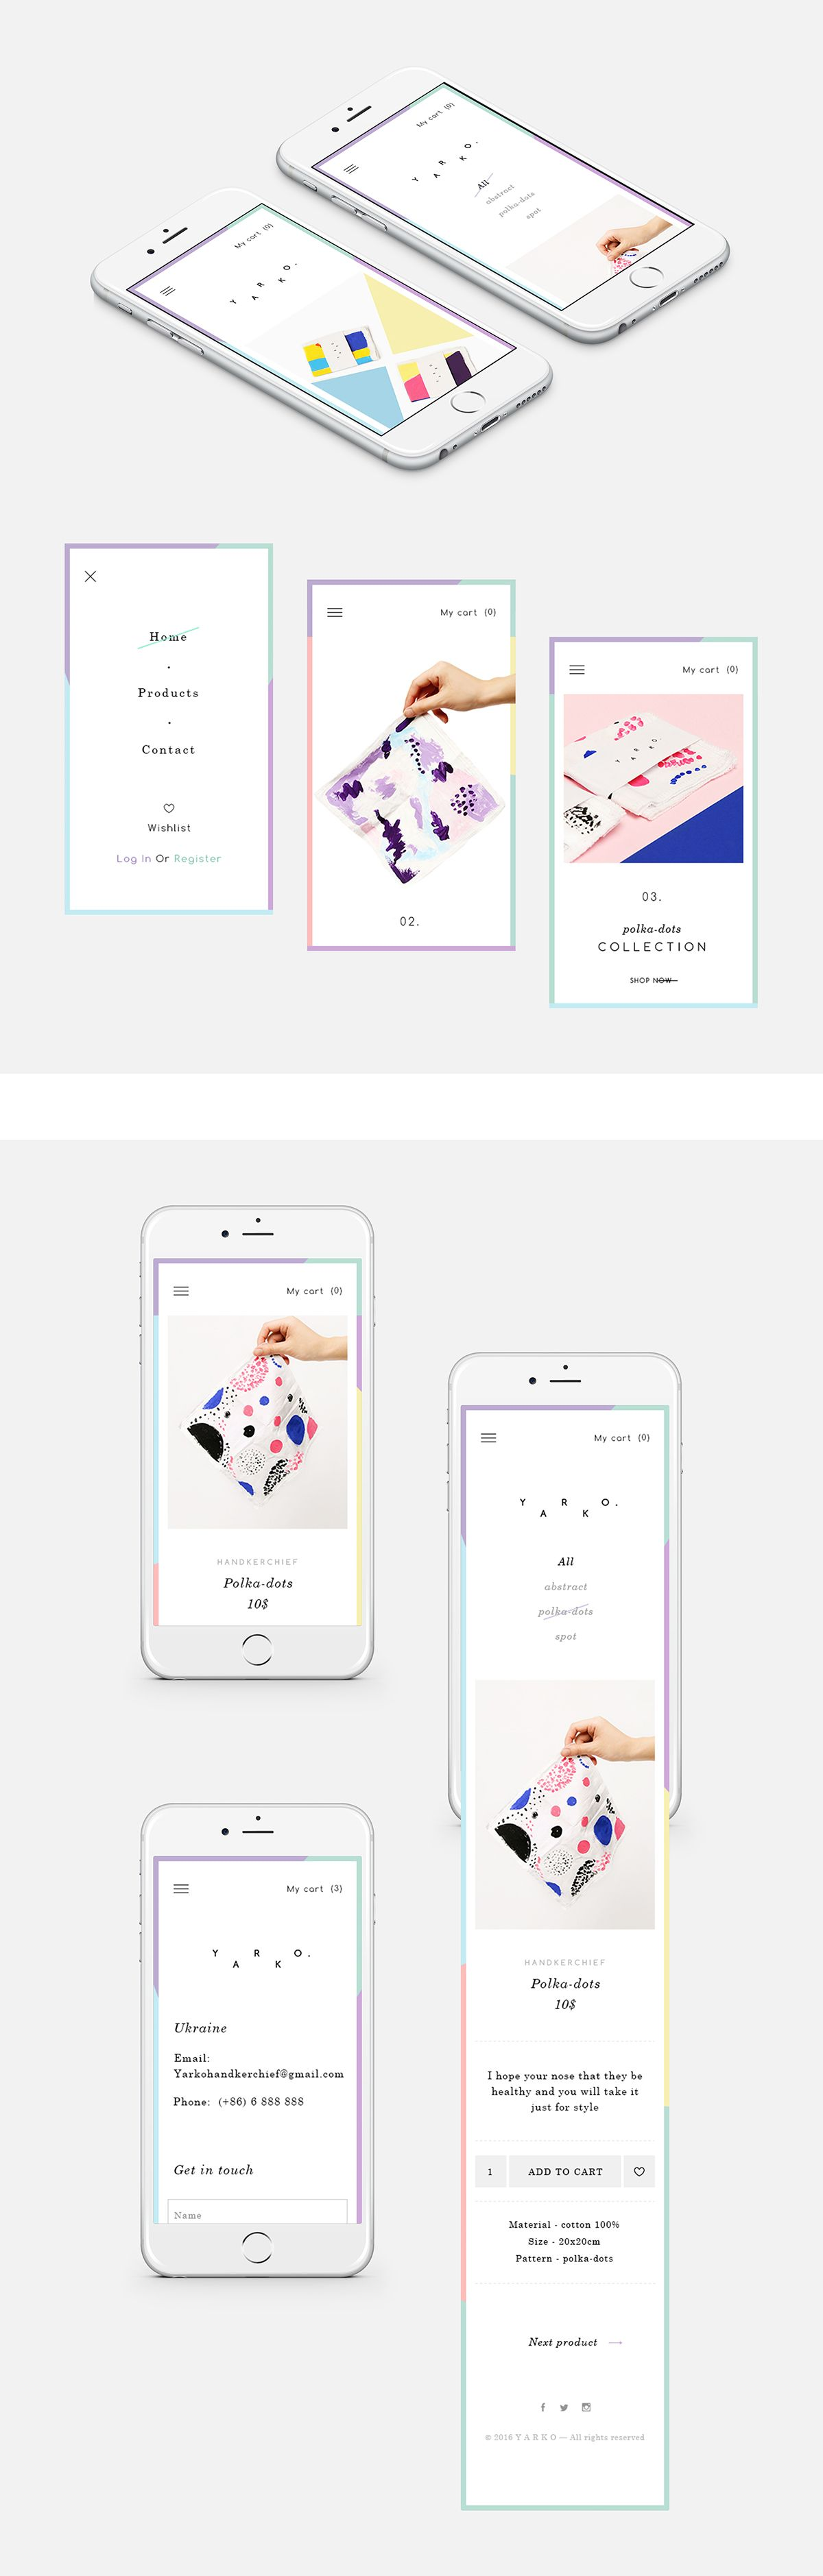 Y A R K O e commerce website on Behance